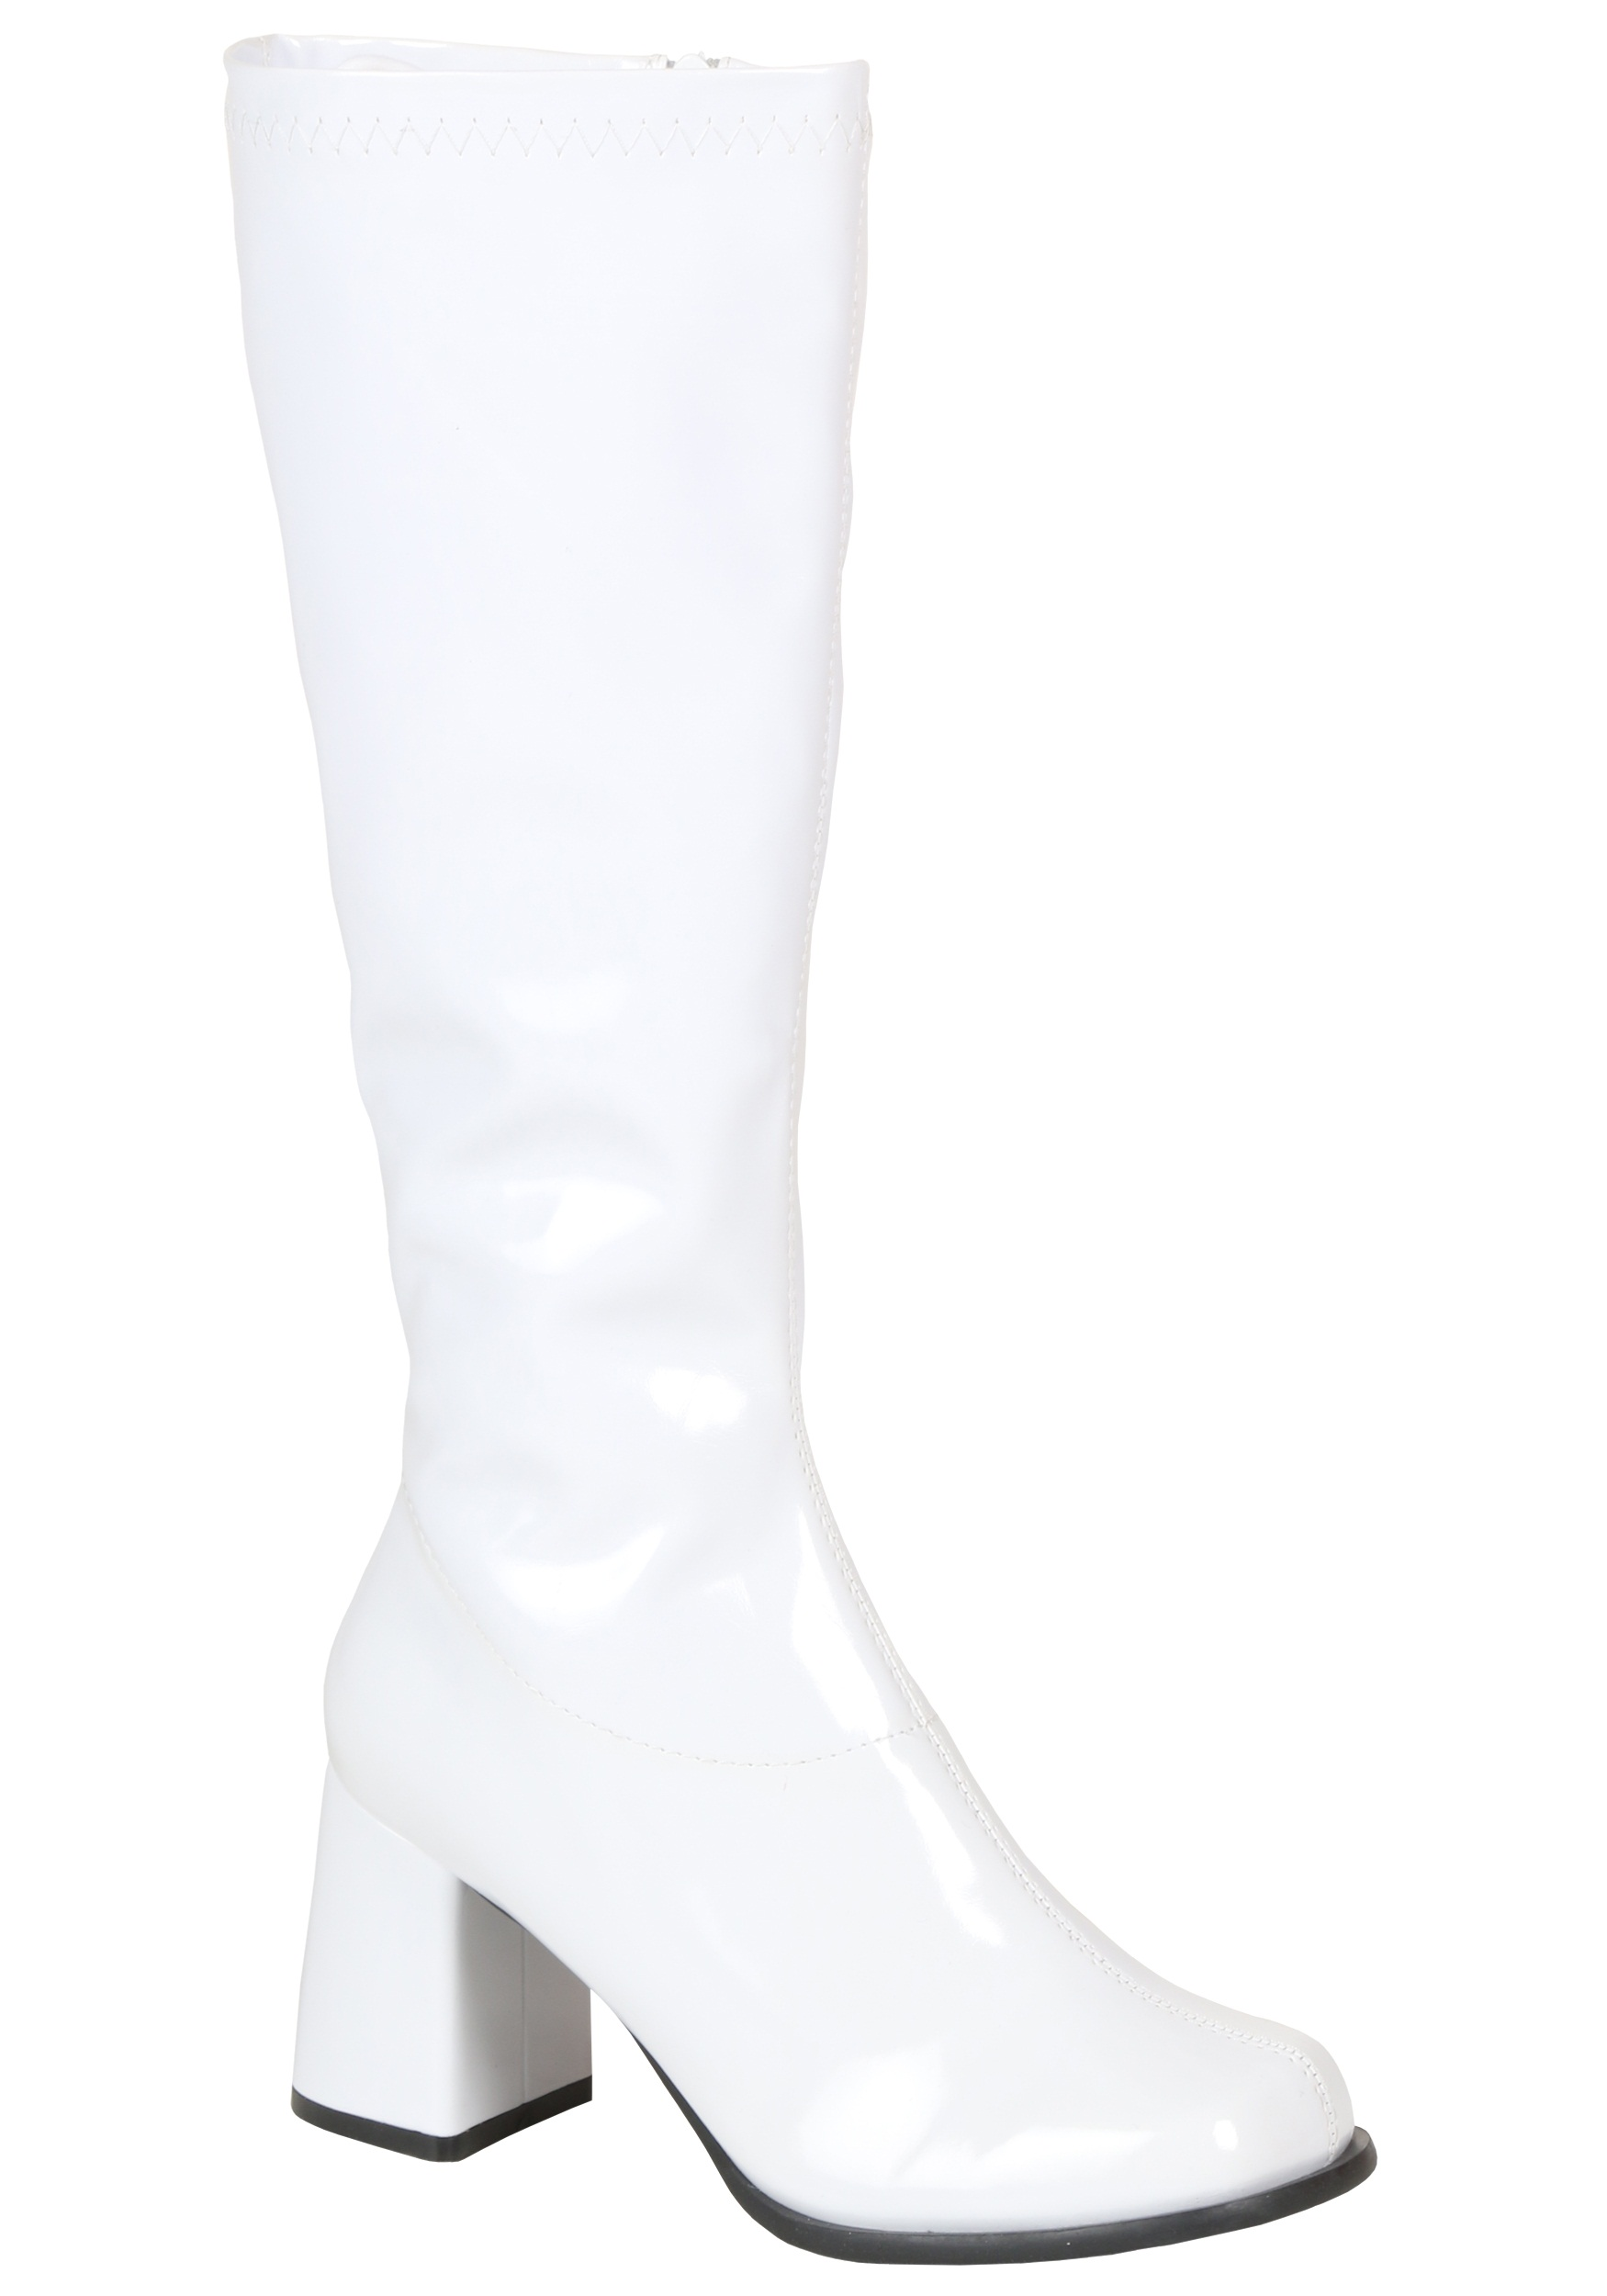 929be0c2b97 Womens Wide Calf Disco Boots